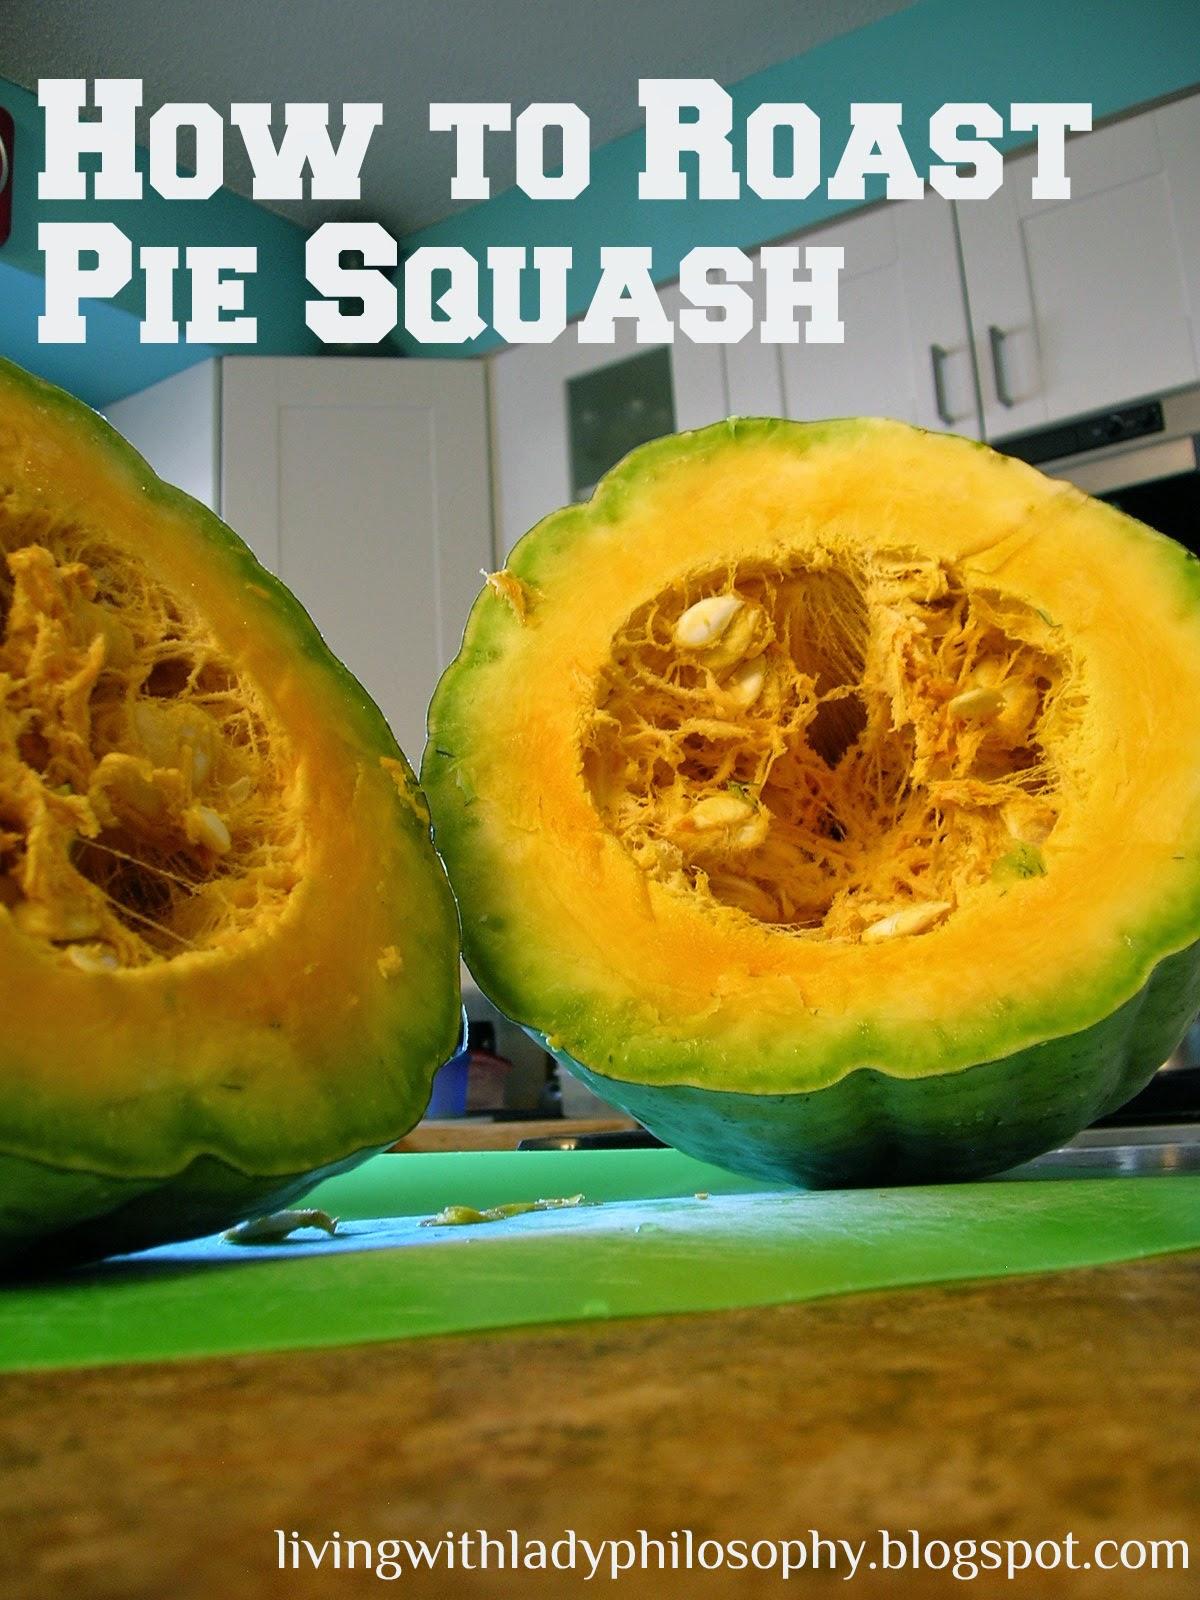 http://livingwithladyphilosophy.blogspot.com/2012/10/blue-hubbard-pumpkin-pie.html